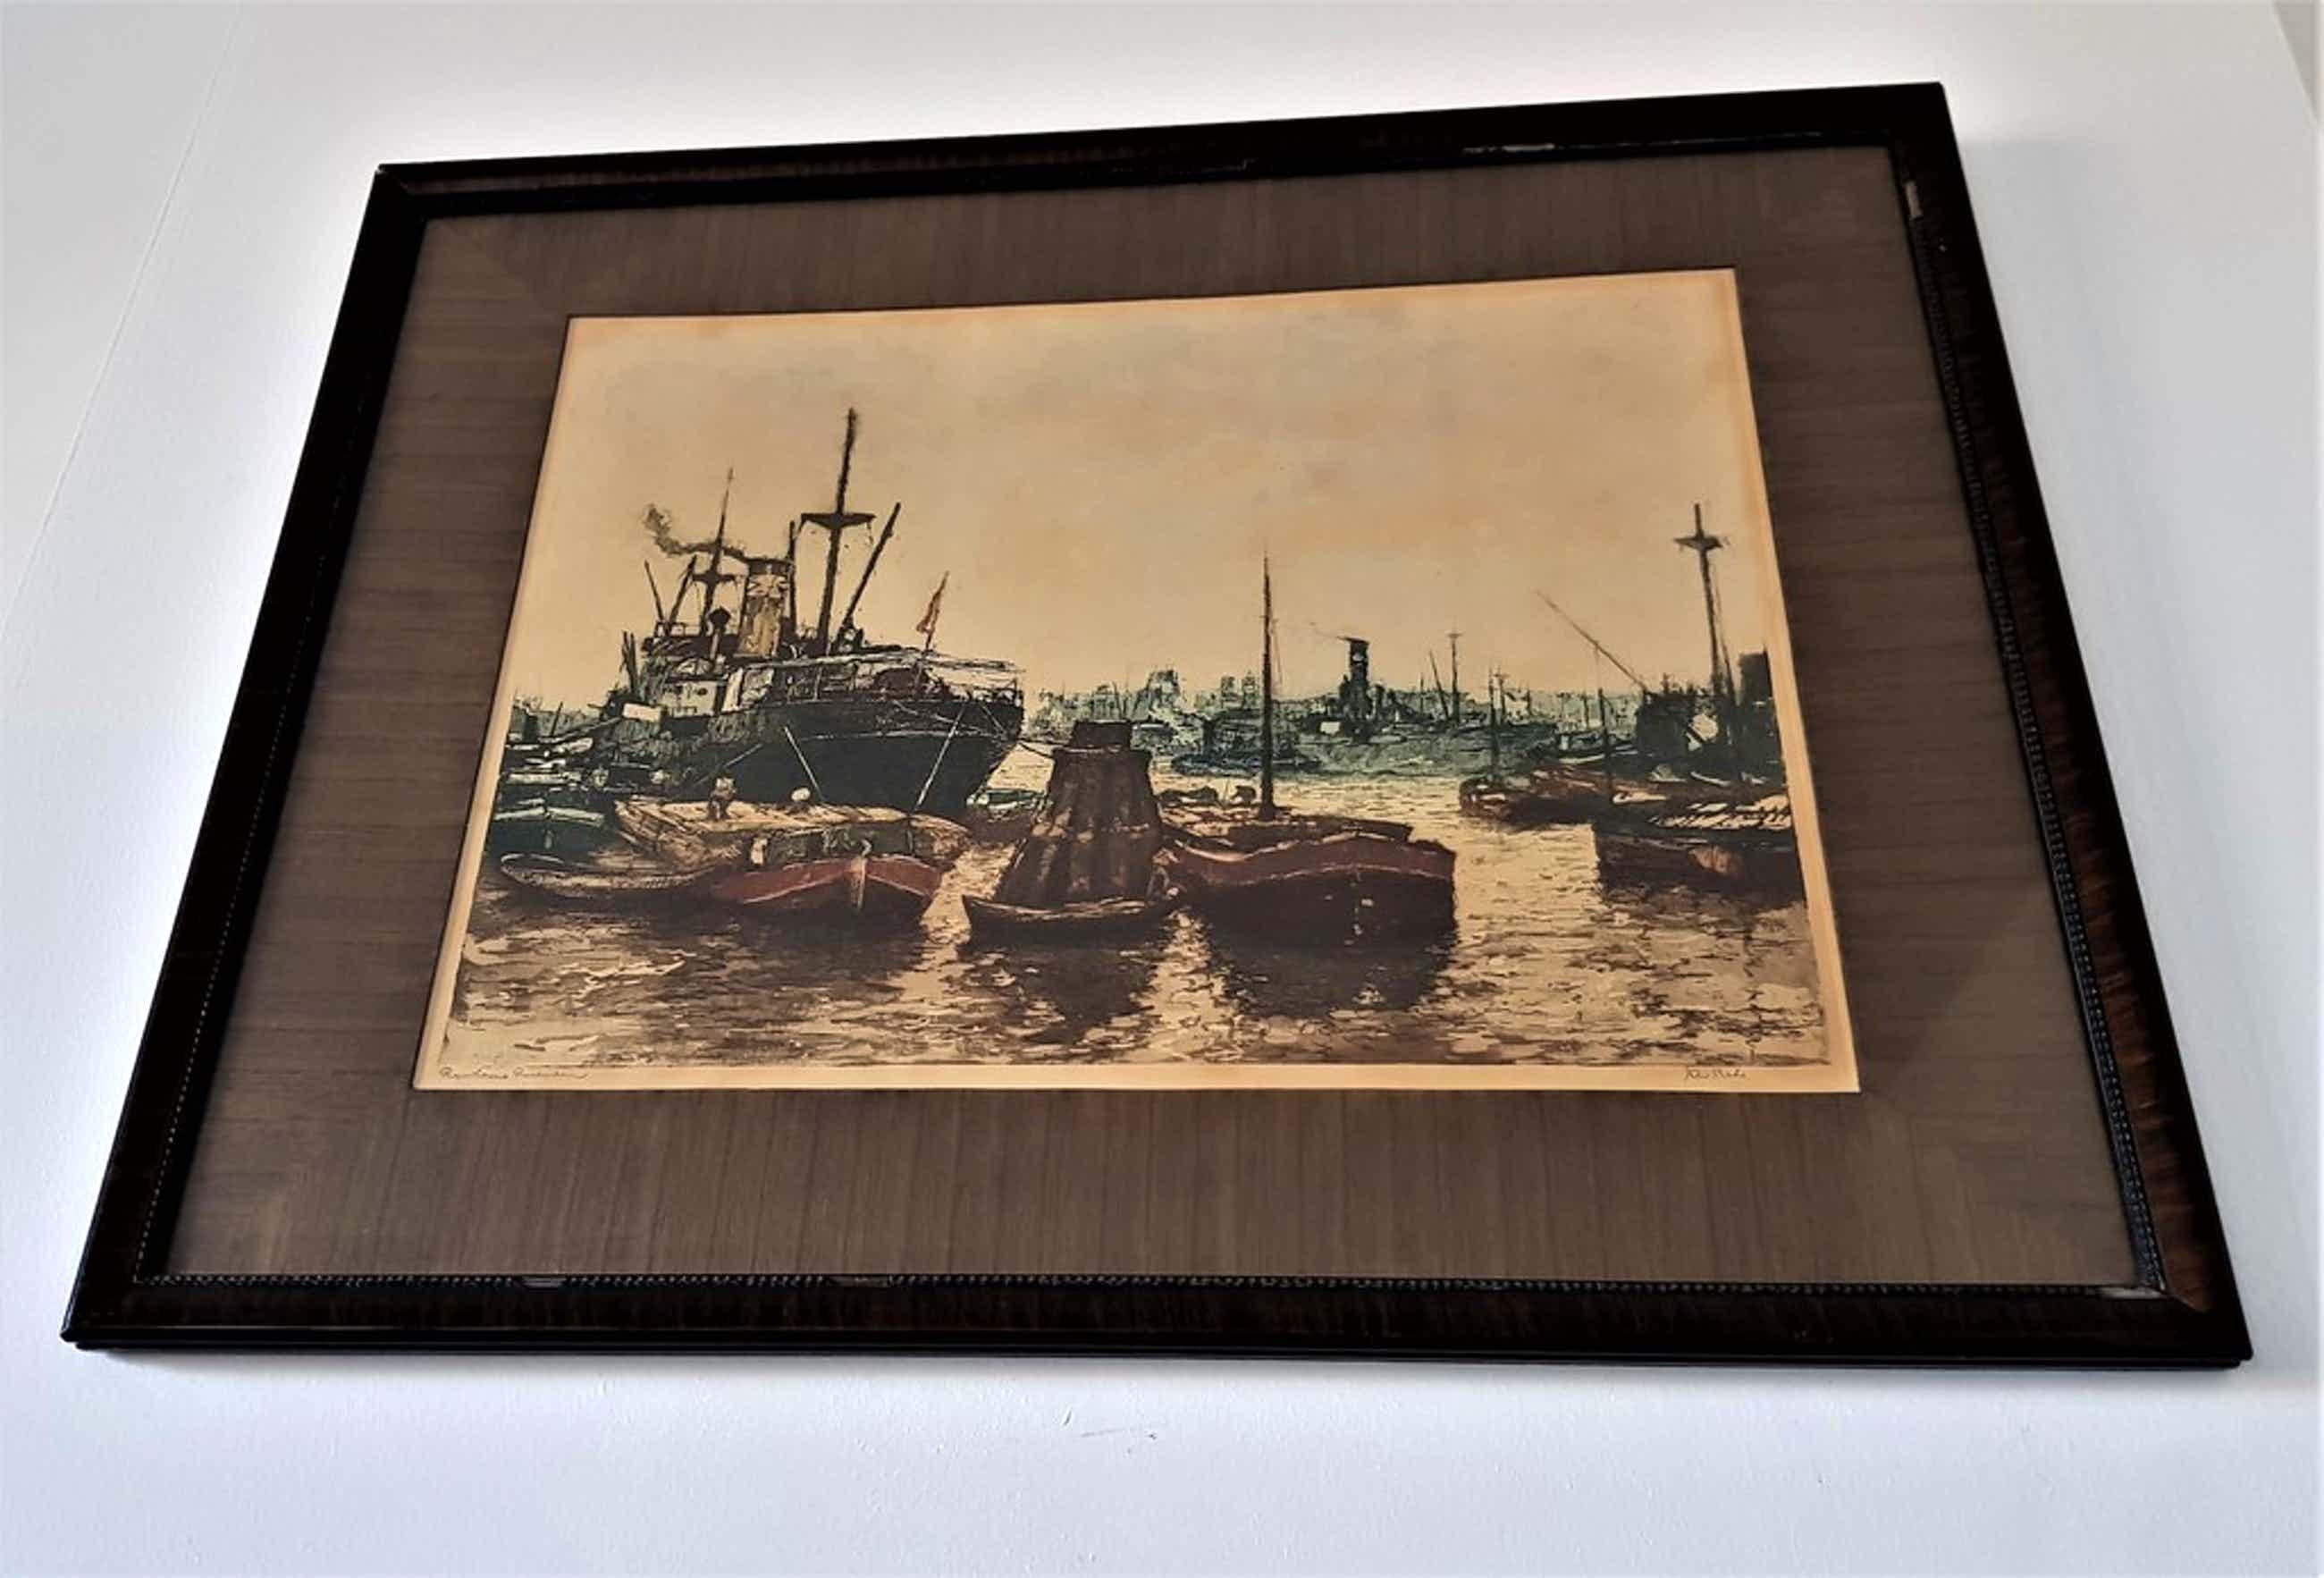 Jan Sirks - Jan Sirks (Rotterdam 1885-1938 Zeist), kopen? Bied vanaf 40!